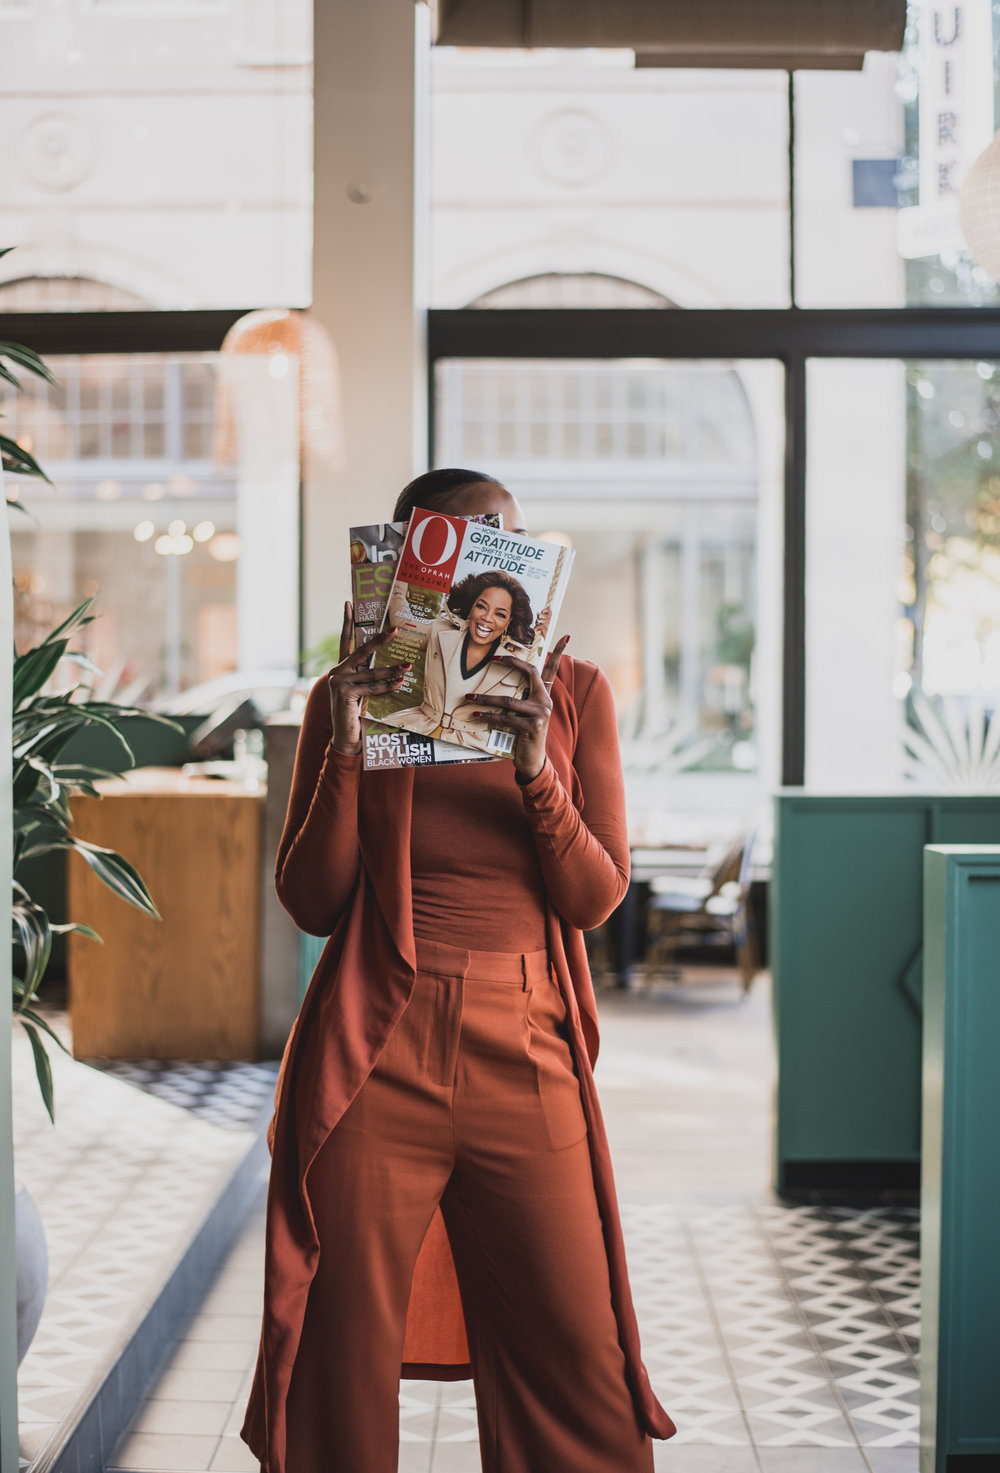 blogger and influencer portraits